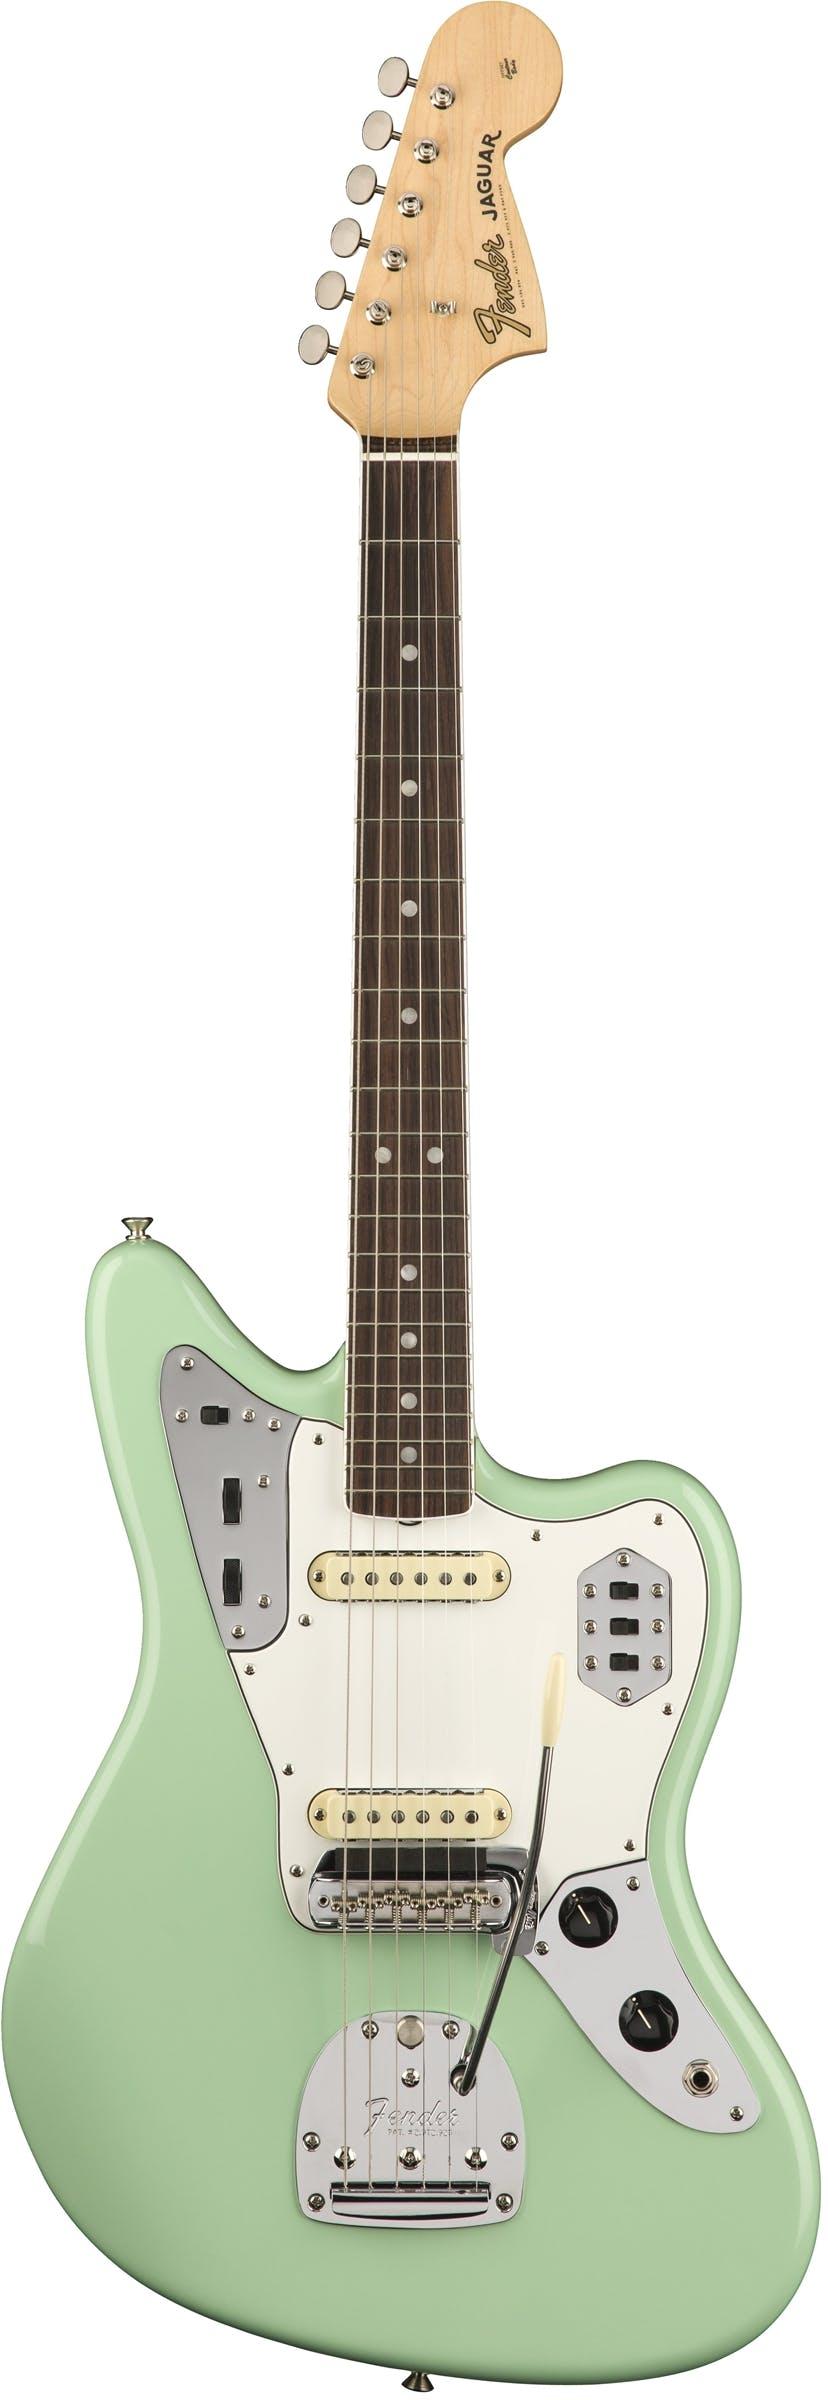 Vintage 60s Original Fender Jazzmaster//Jaguar Tremolo//Tailpiece mounting screws